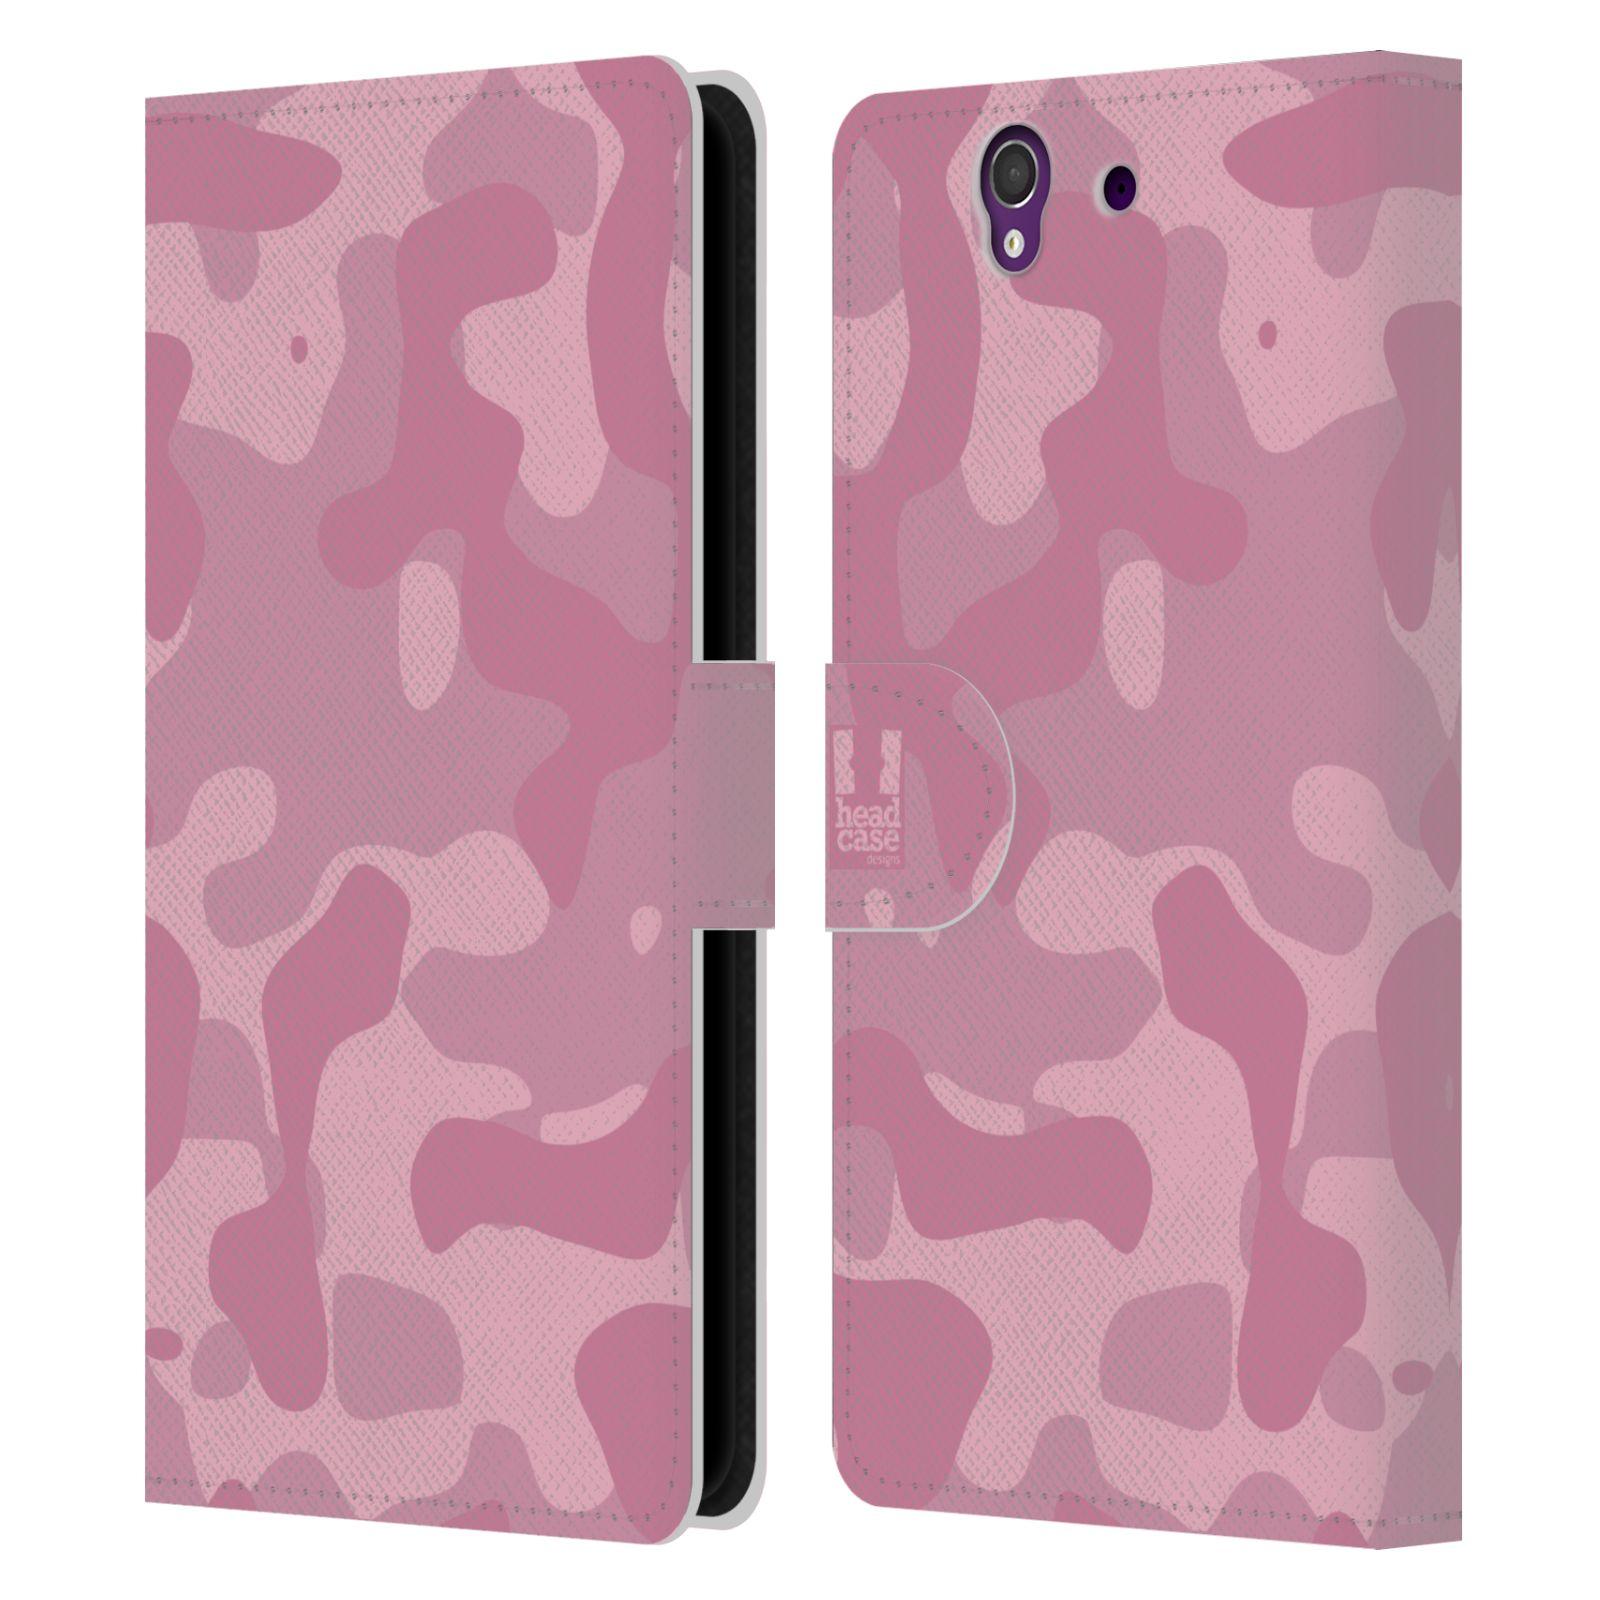 HEAD CASE Flipové pouzdro pro mobil SONY XPERIA Z (C6603) lehká barevná kamufláž růžová